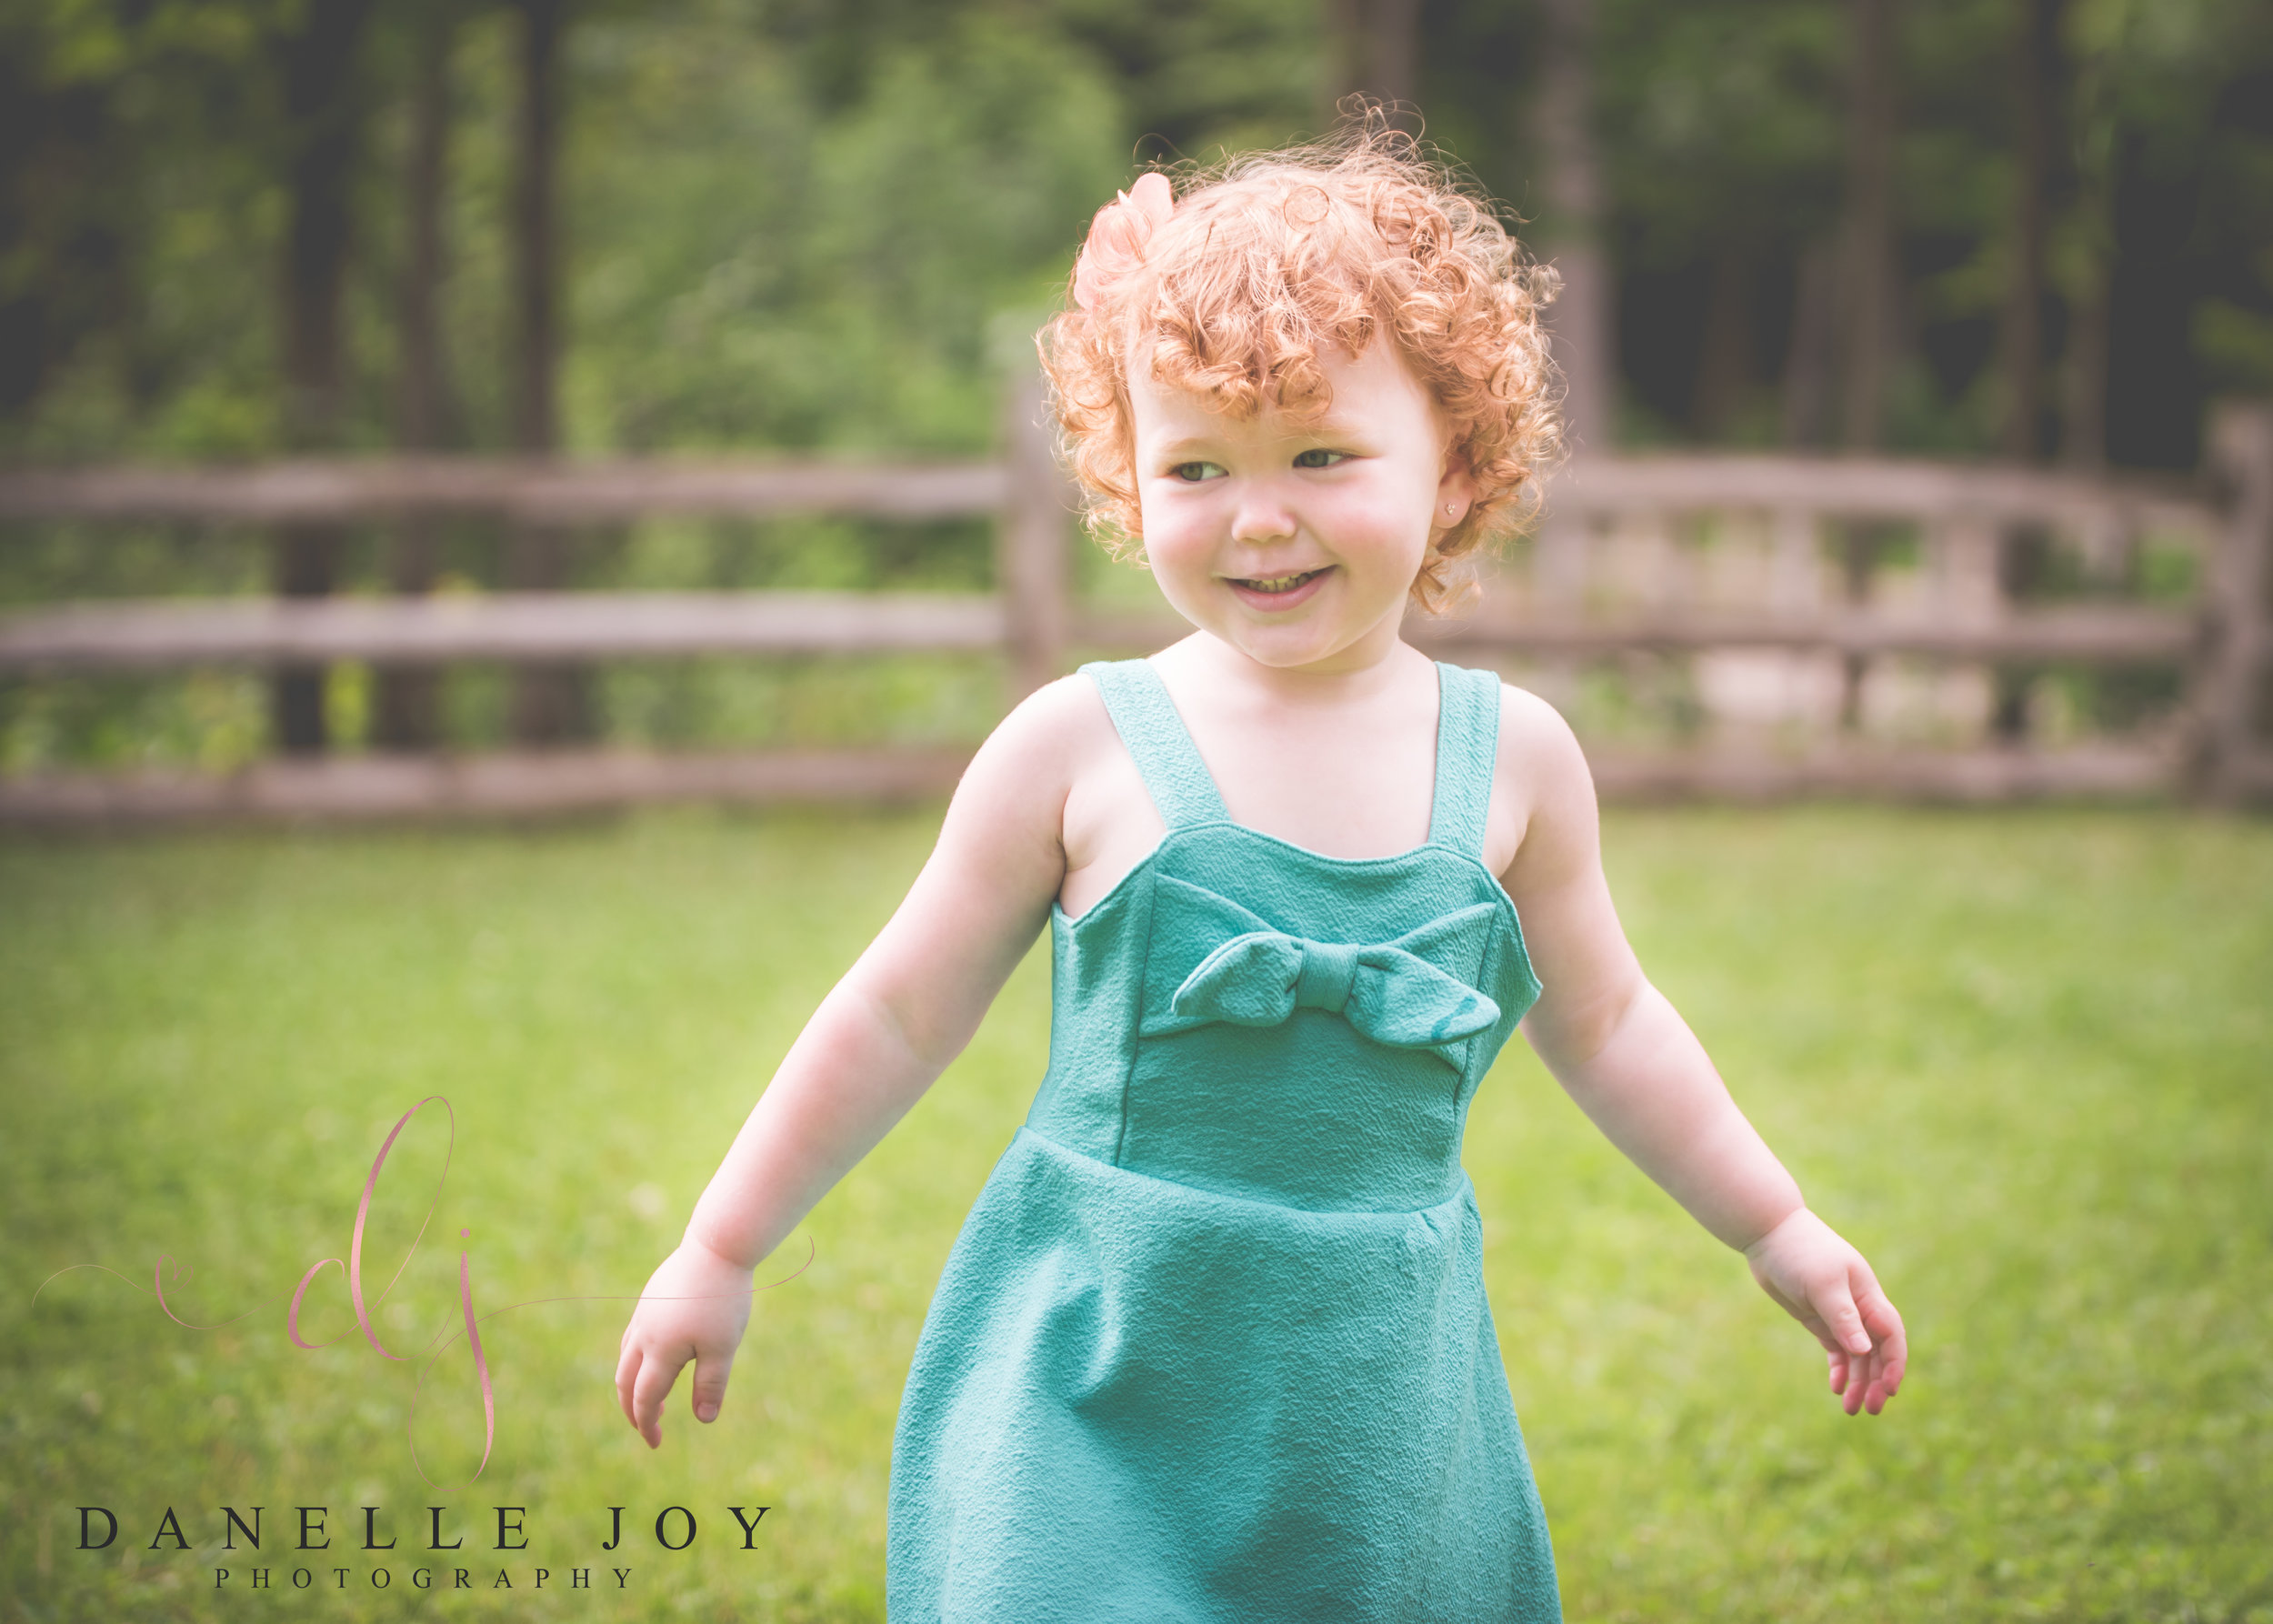 child photographer, child photography, milestone photographer, milestone photography